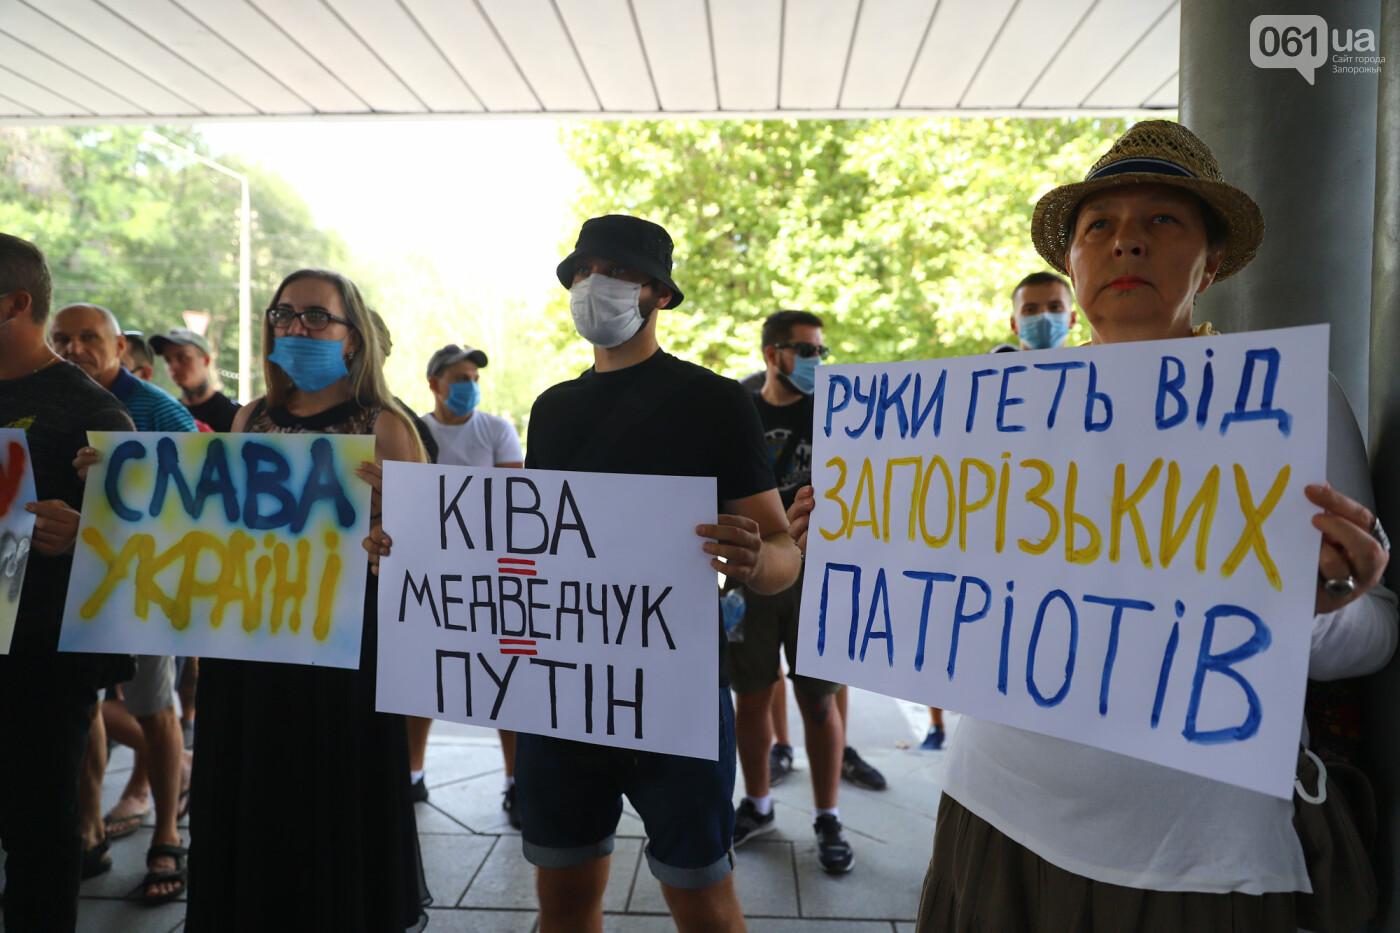 """Захист країни - не злочин"": в Запорожье патриоты провели митинг у стен нацполиции, - ФОТОРЕПОРТАЖ , фото-10"